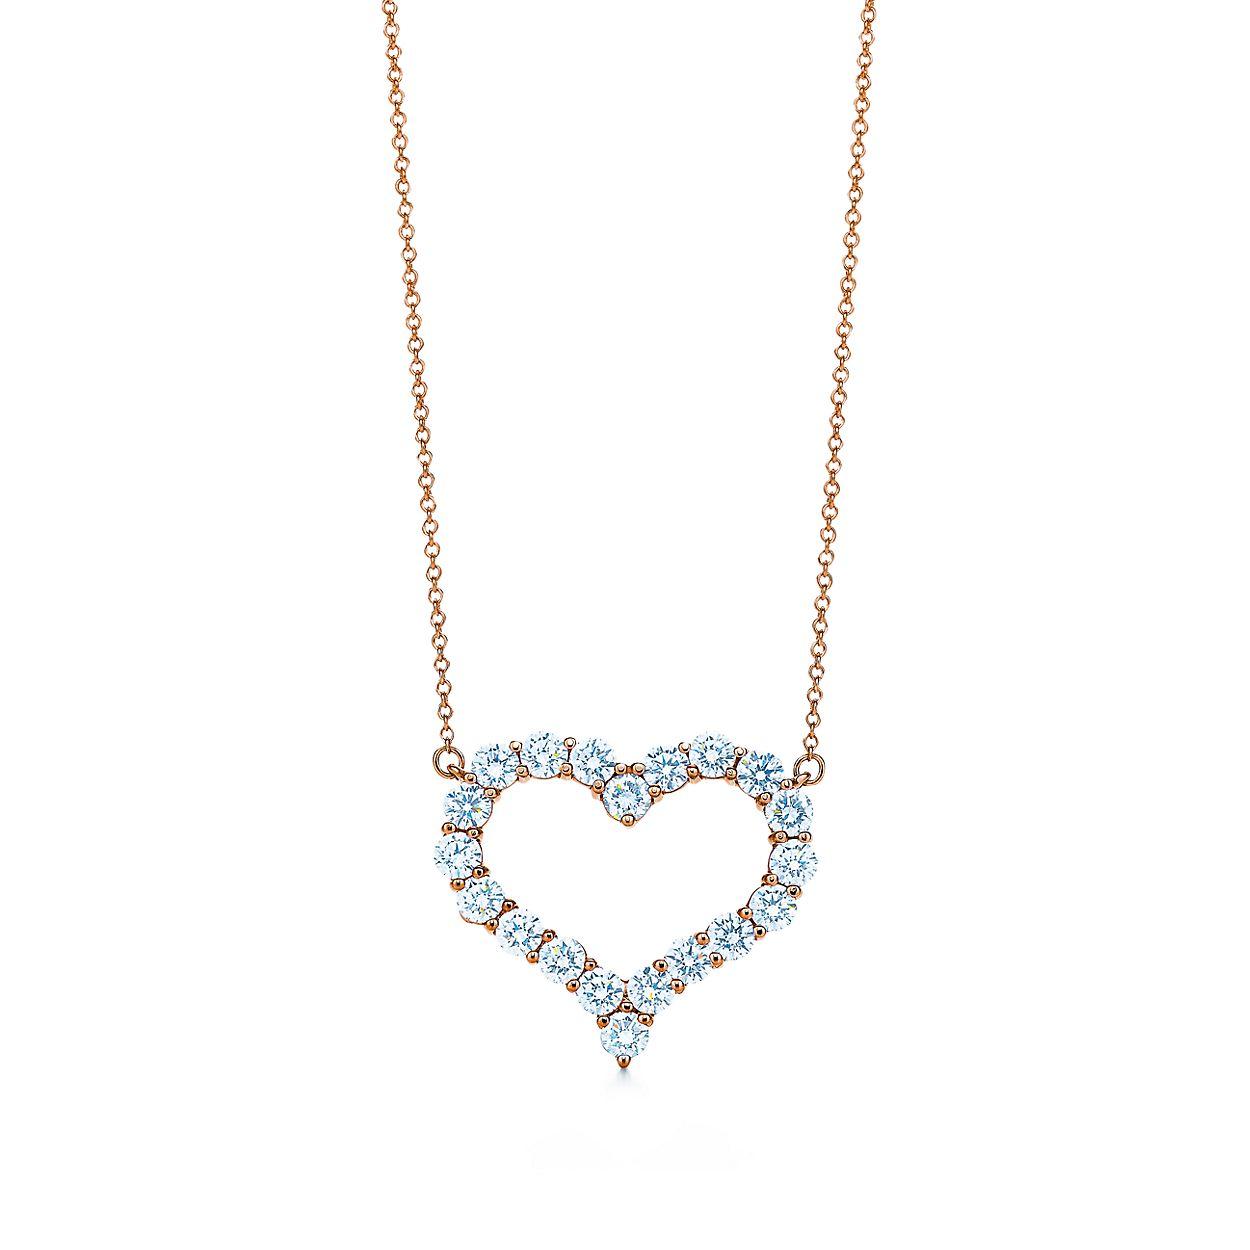 Pendentif en or rose 18 carats et diamants, Tiffany Hearts™. Large ... 76544728545f